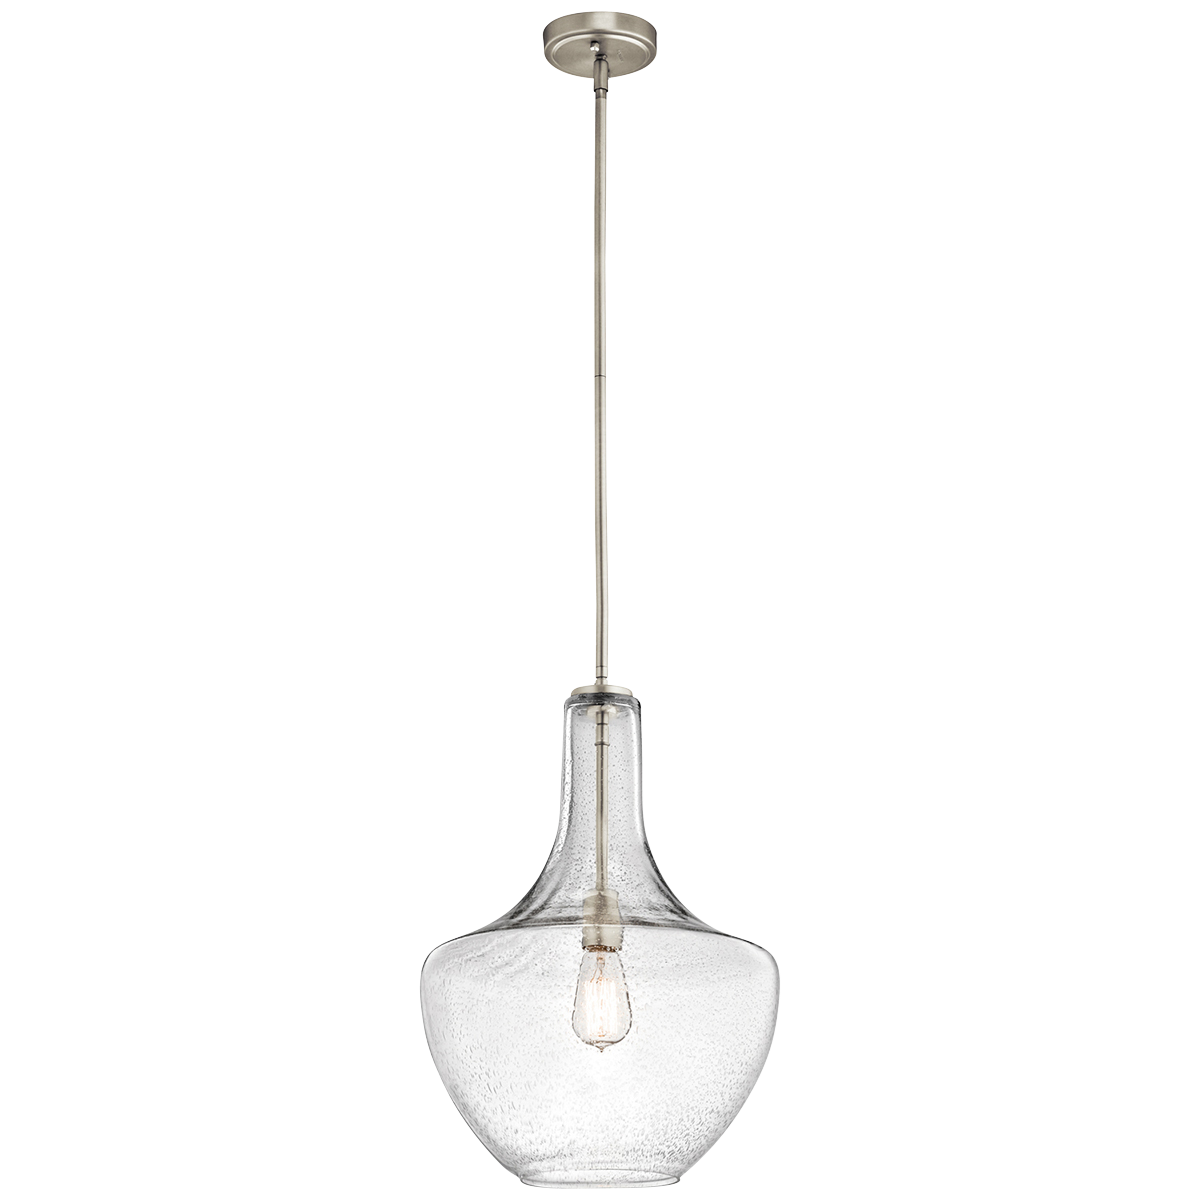 1 Light Pendant - Everly Collection - Kichler Lighting - pendant ...